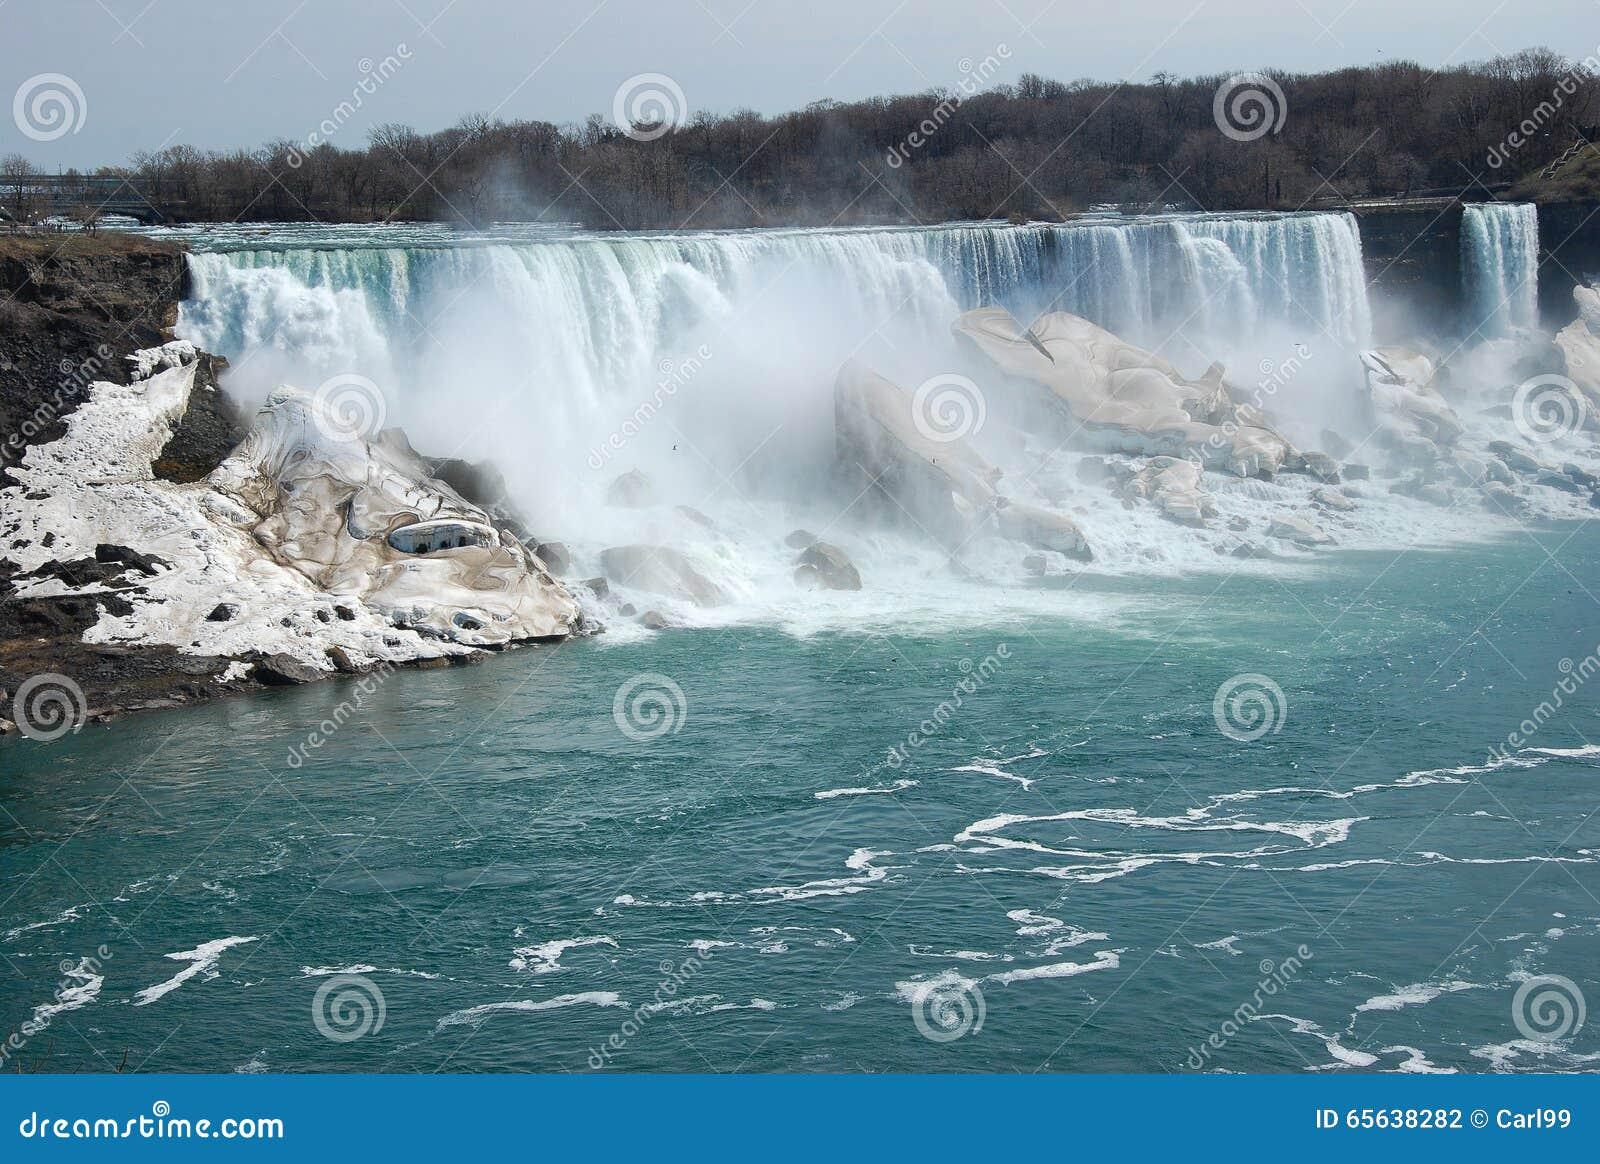 La beauté des chutes du Niagara